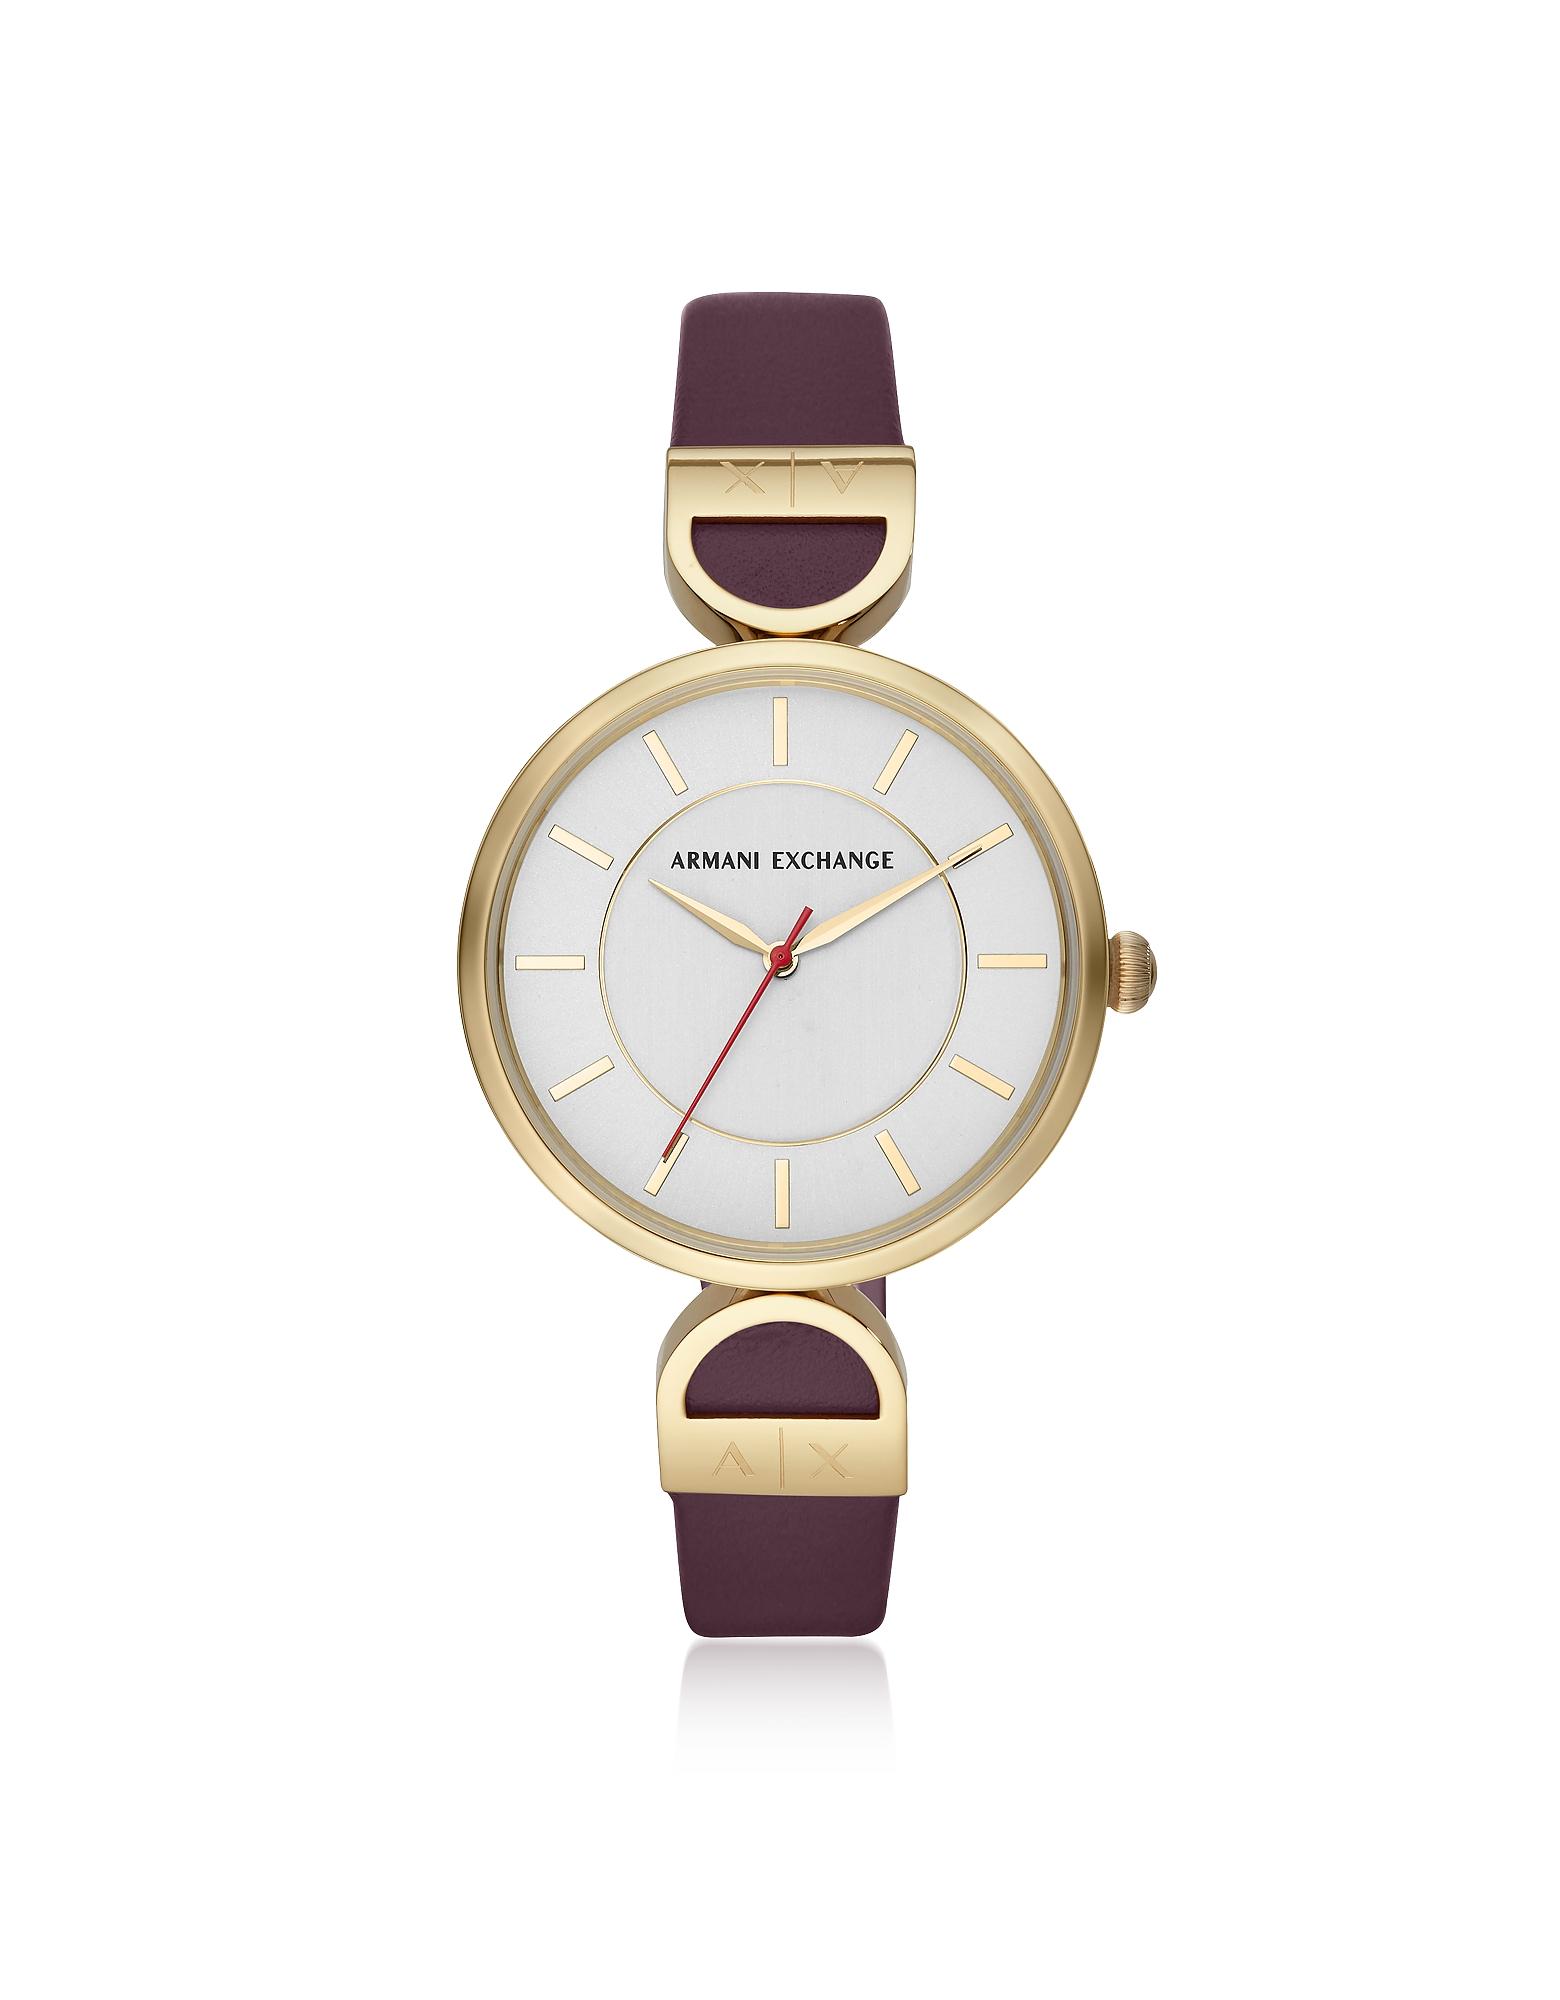 Armani Exchange Women's Watches, Brooke Gold Tone Aubergine Women's Watch